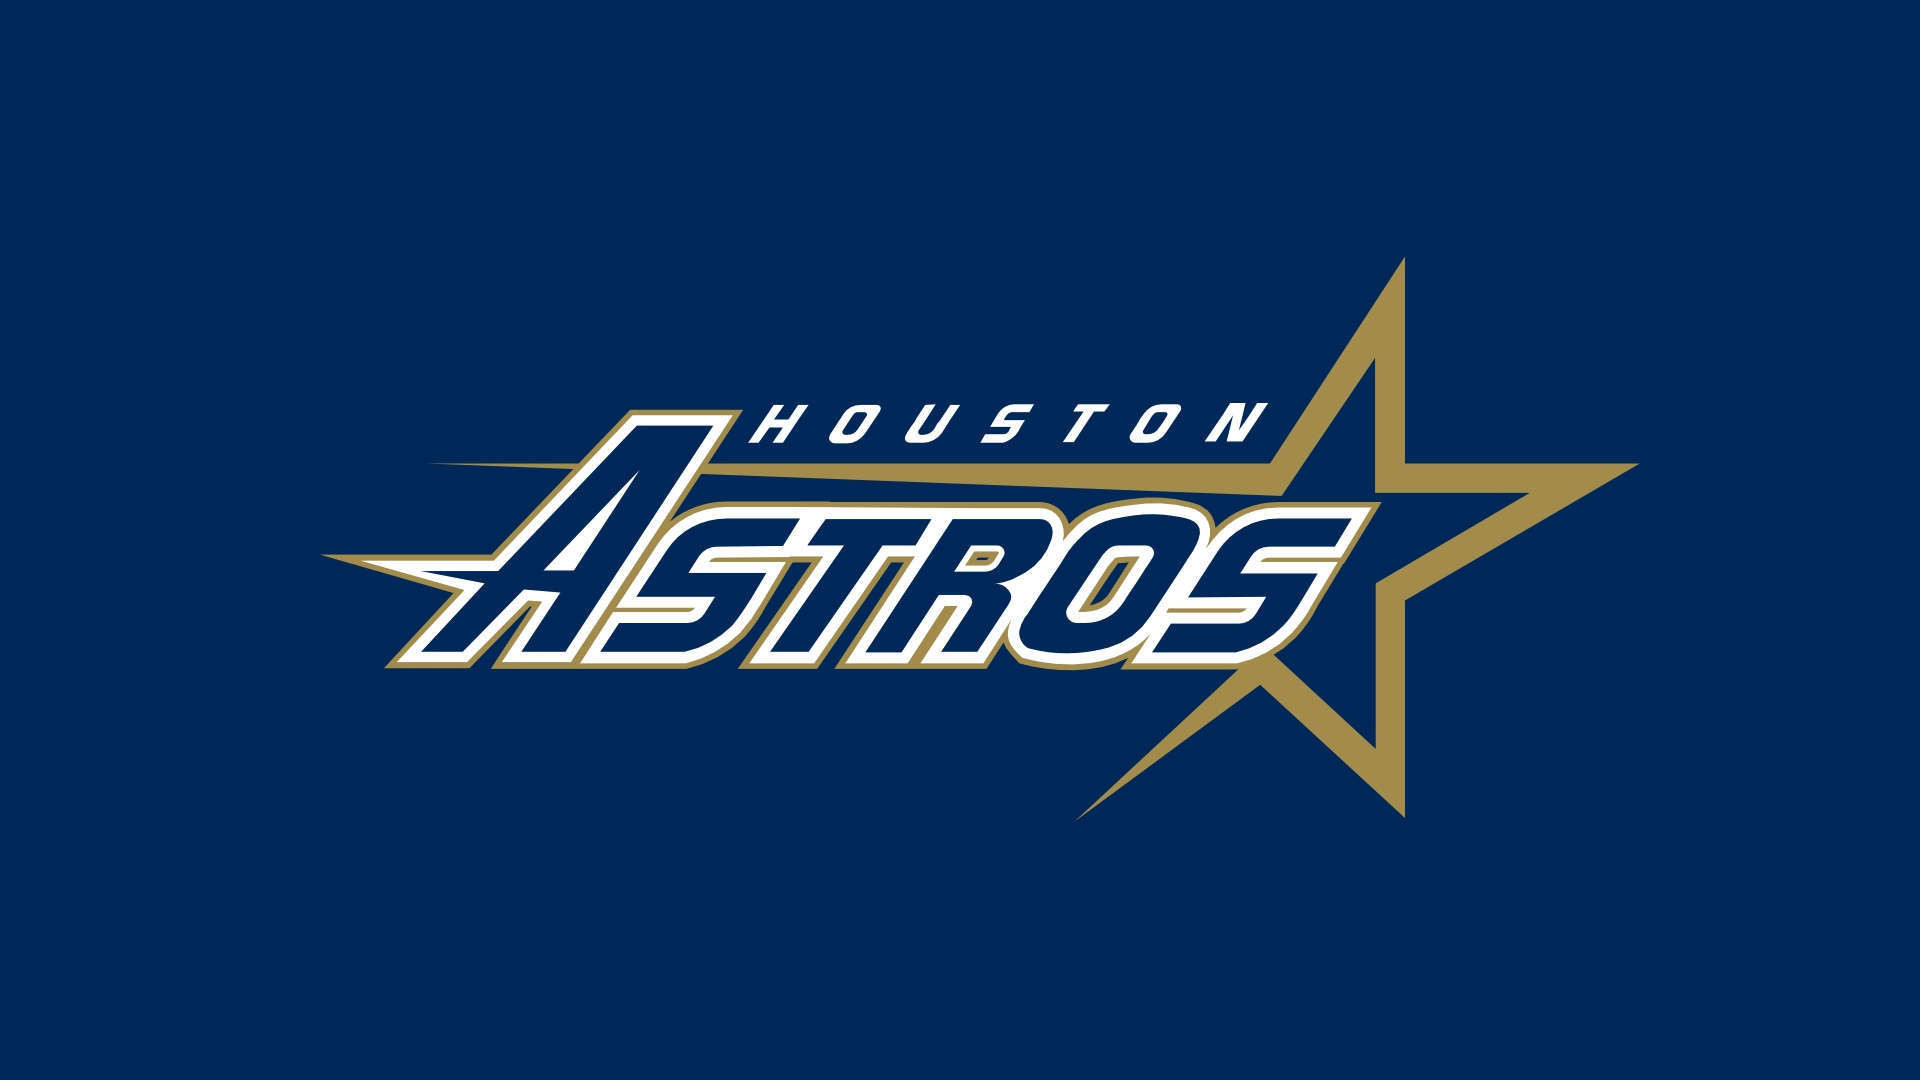 Wallpaper: Houston Astros Logo HD Wallpaper. Upload at April 27, 2014 .